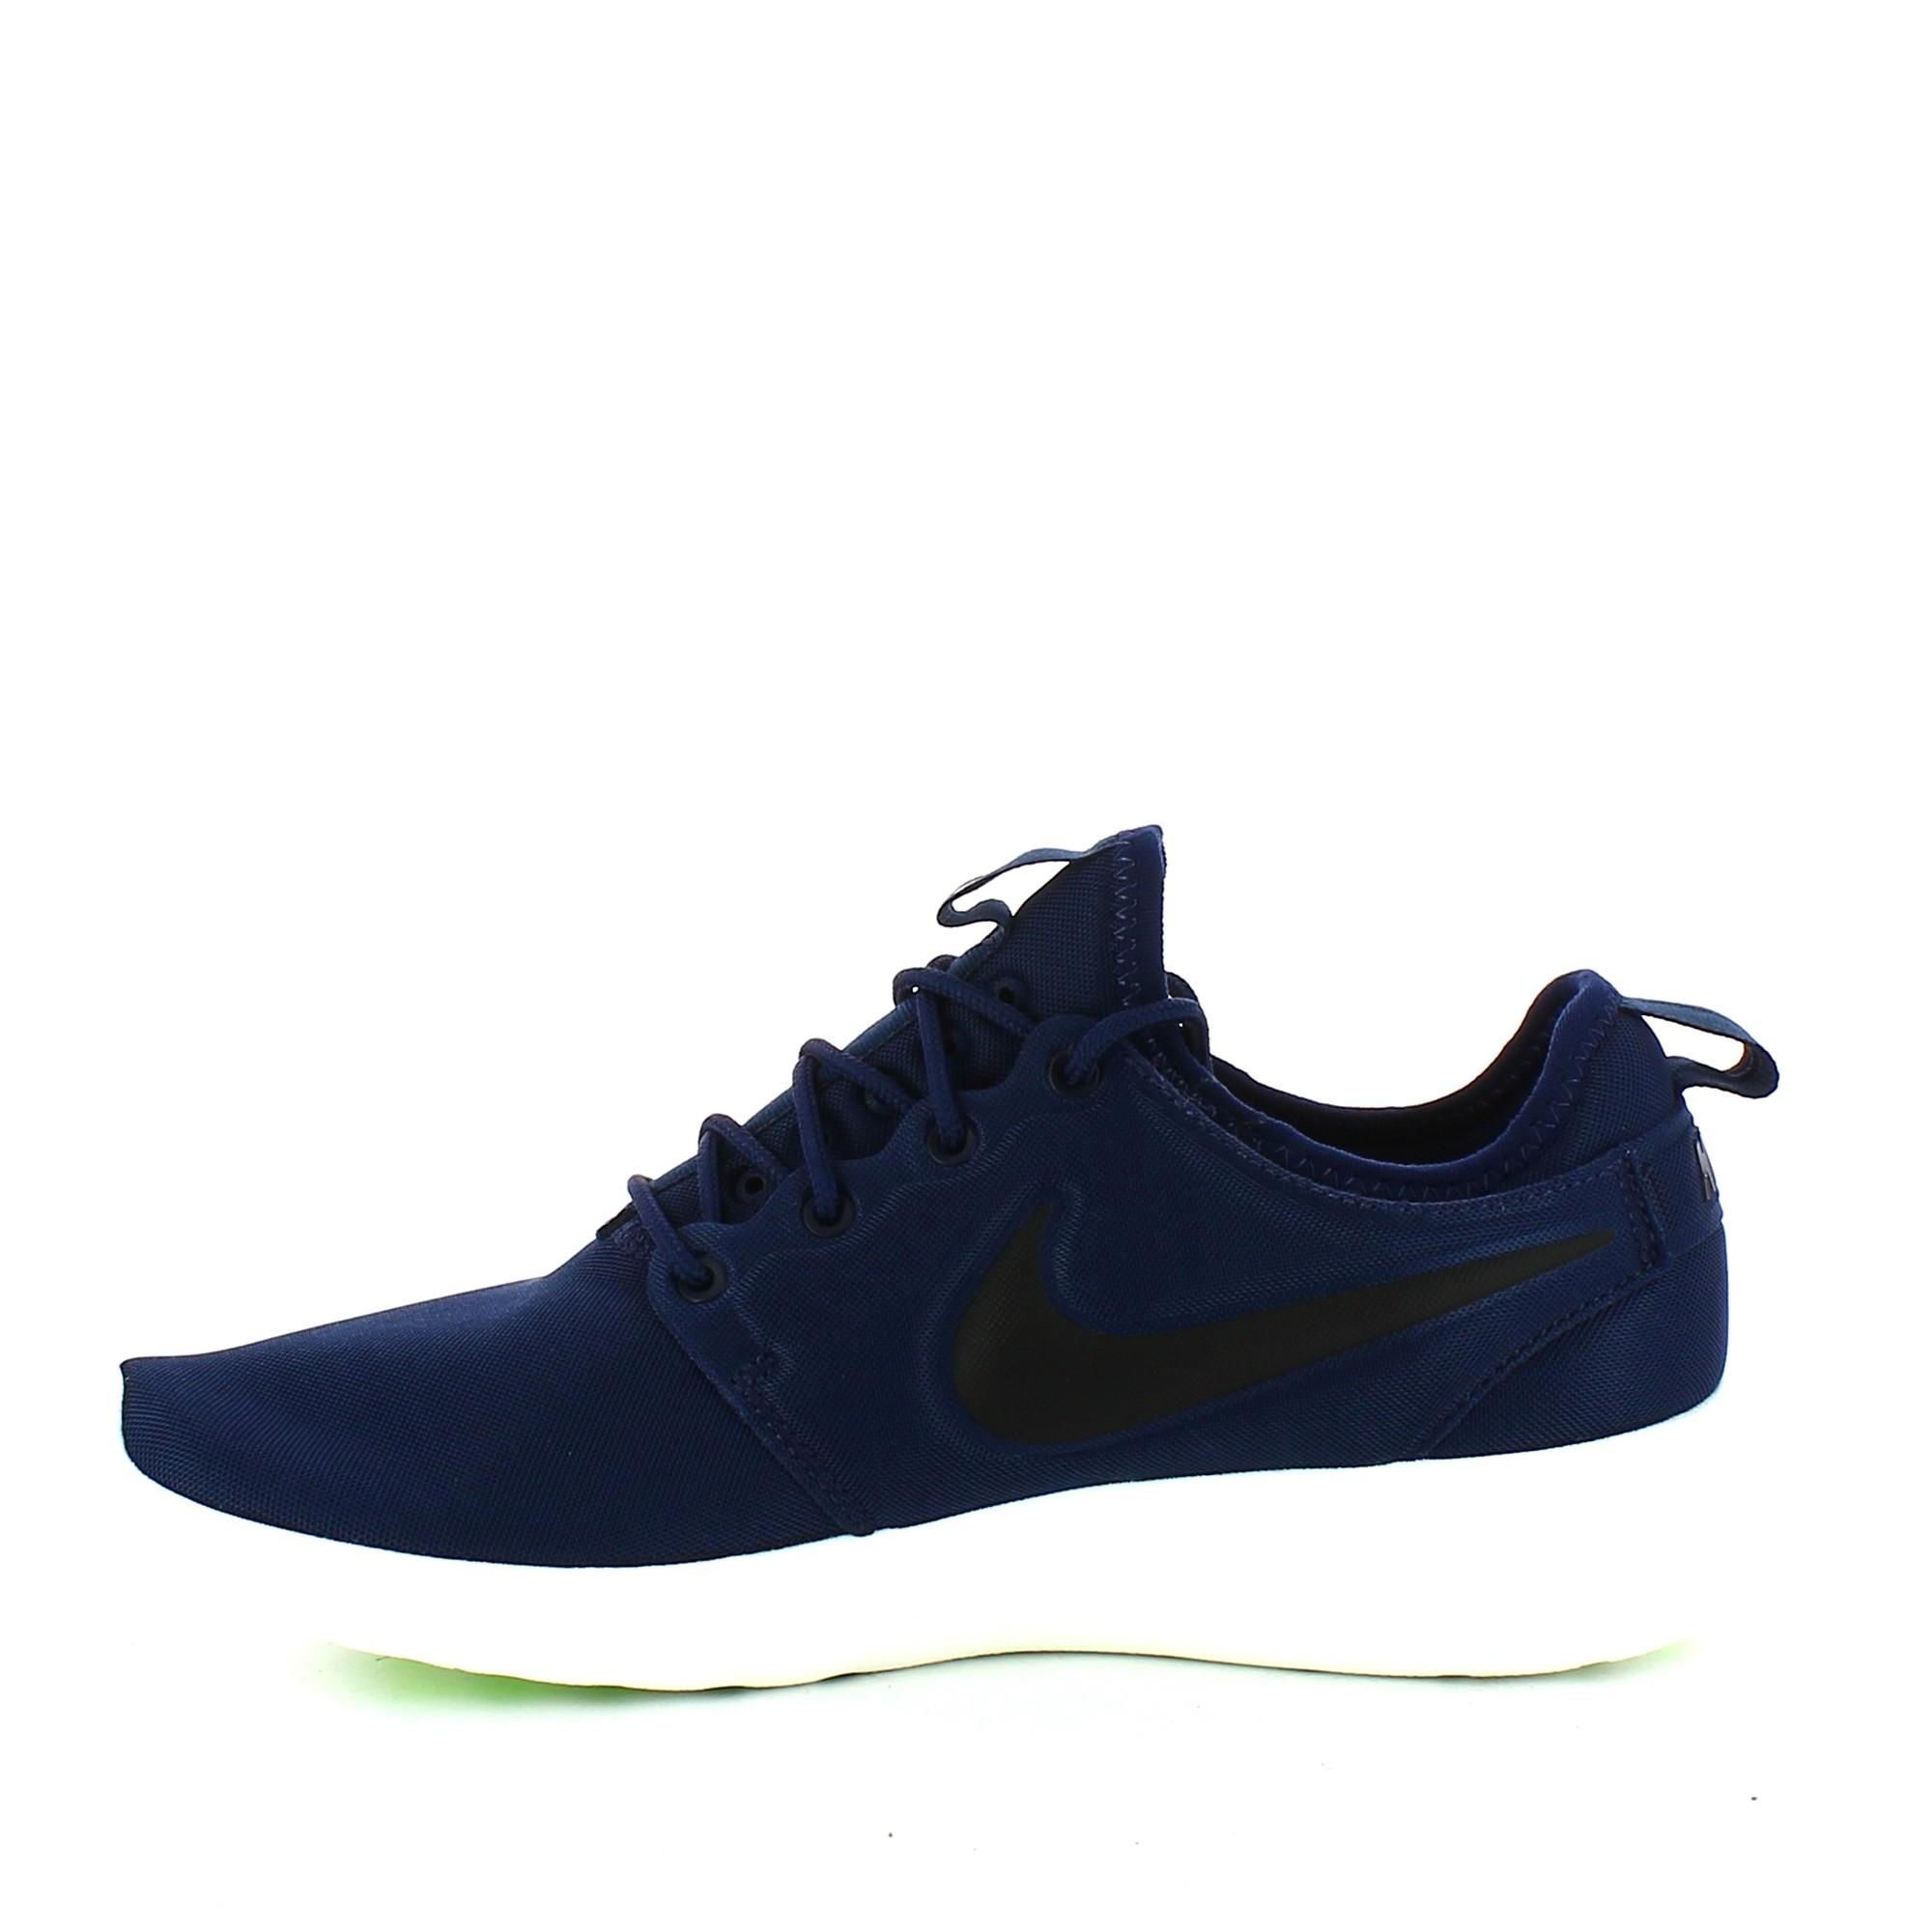 Zapatillas Nike Roshe Two azul marino hombre Deportes Moya